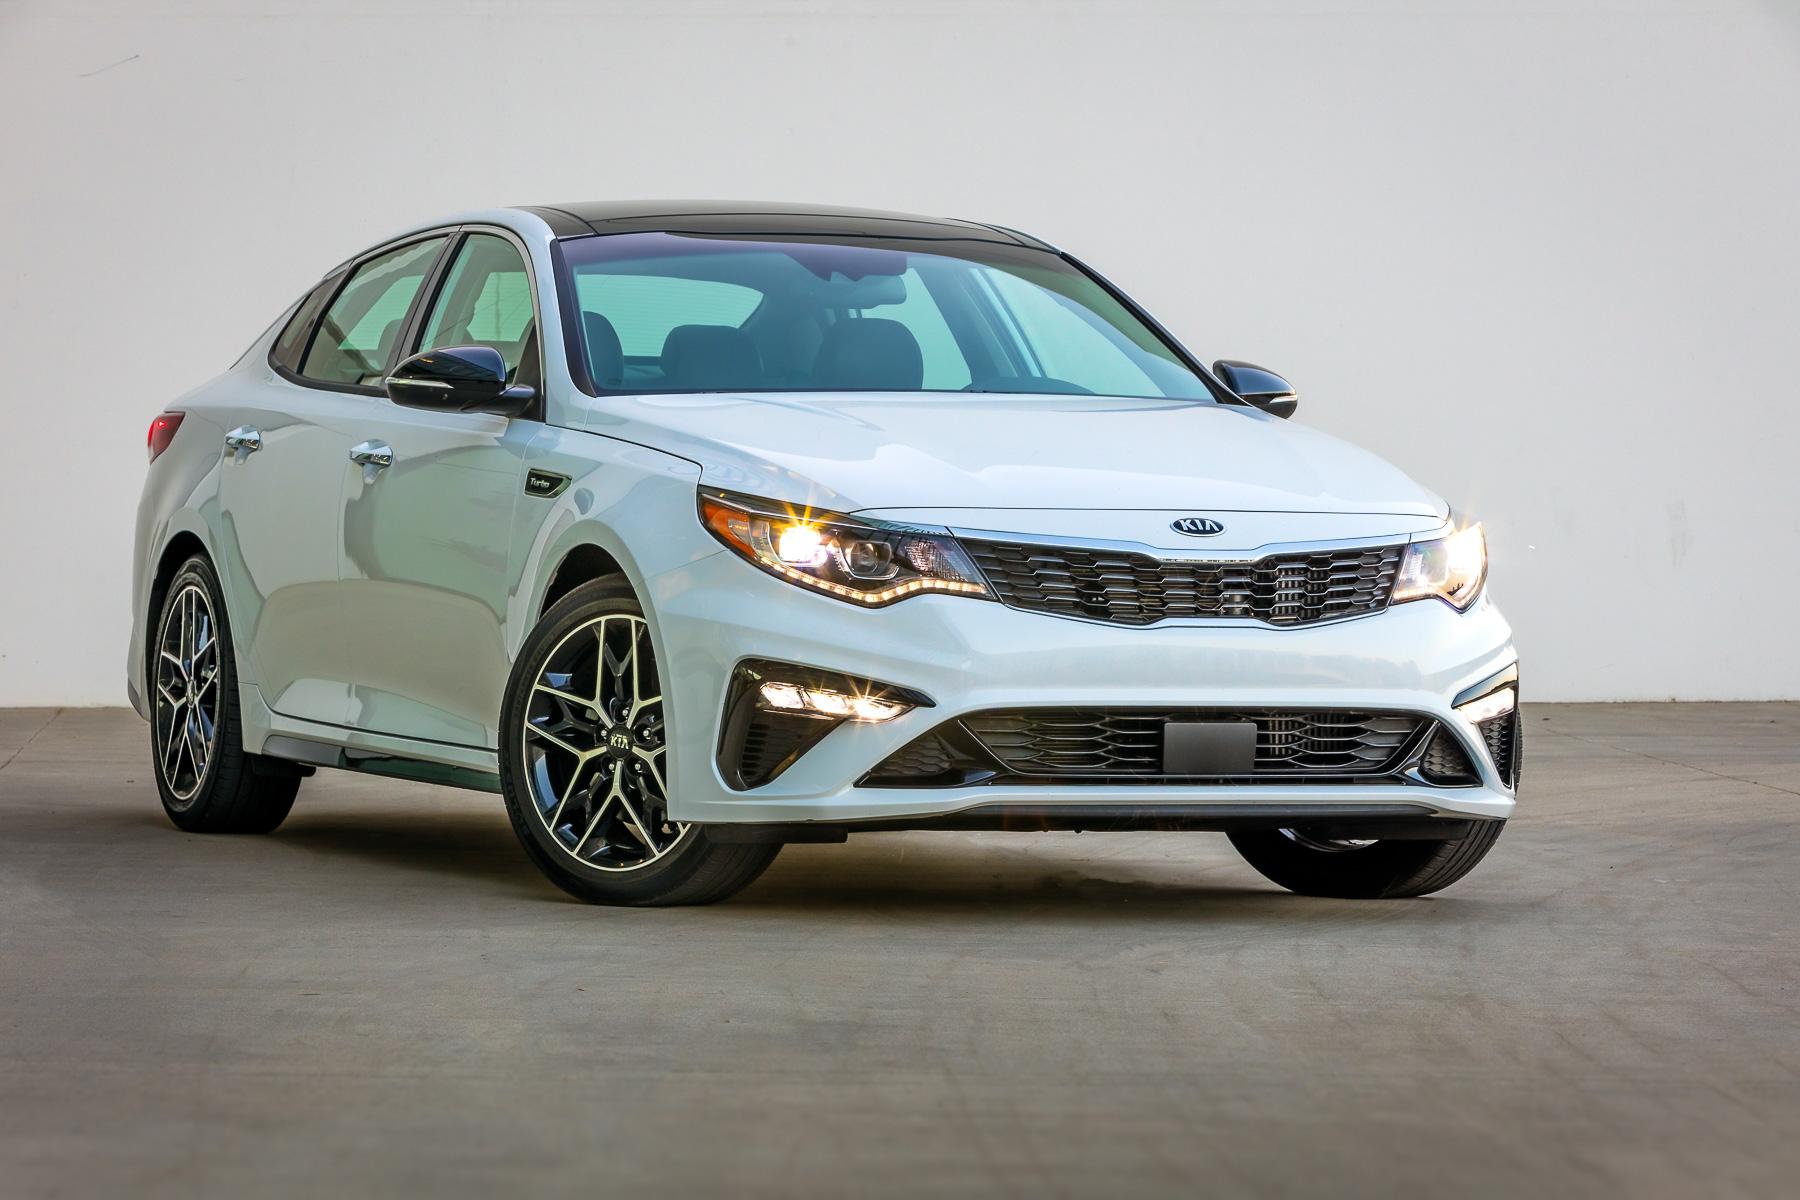 автомобиль Киа Оптима 2020